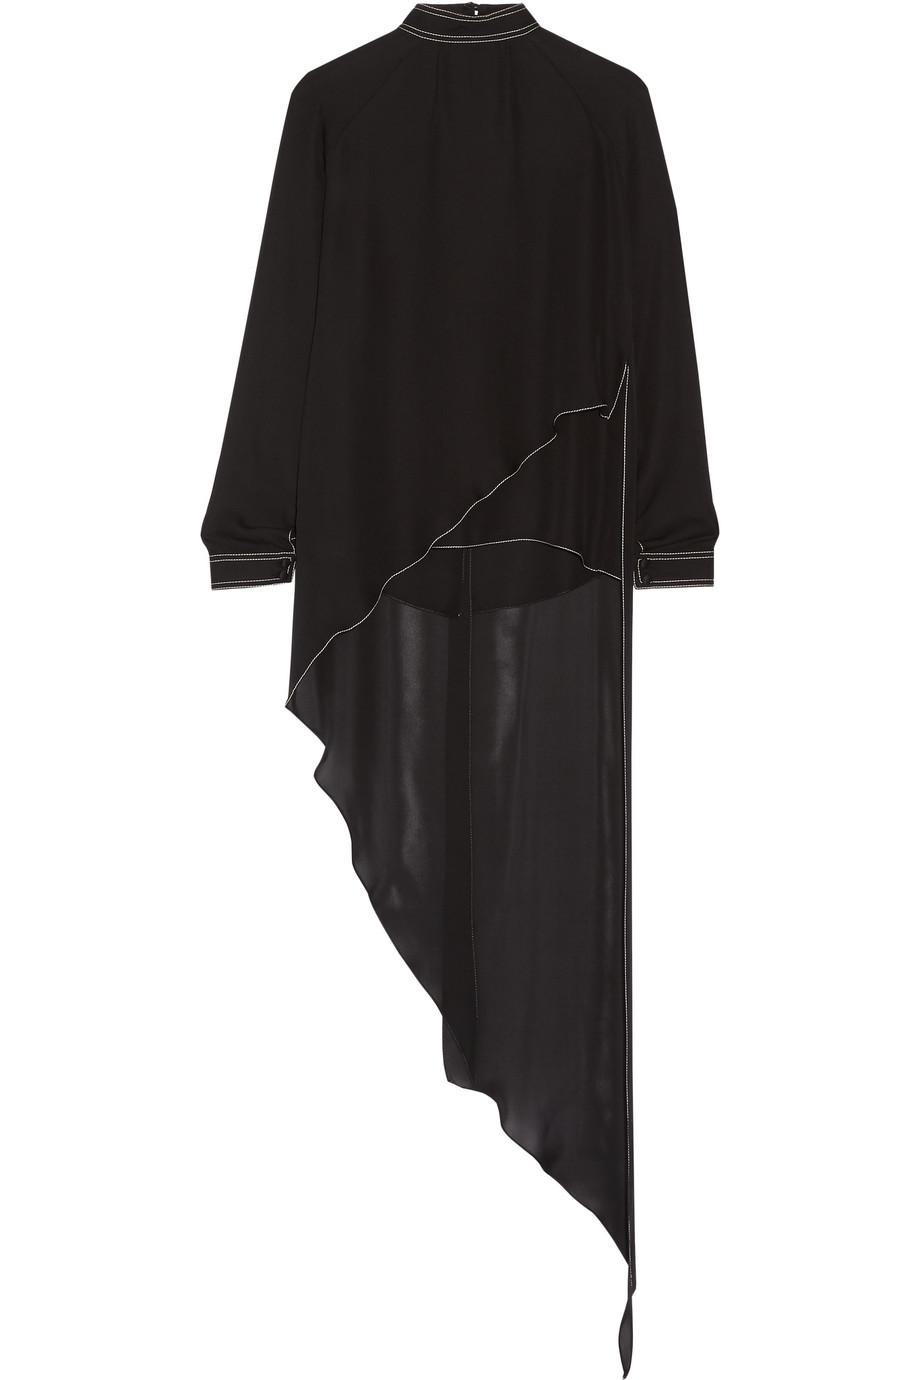 Asymmetric Split-Back Silk Crepe De Chine Blouse, Black, Women's, Size: 2